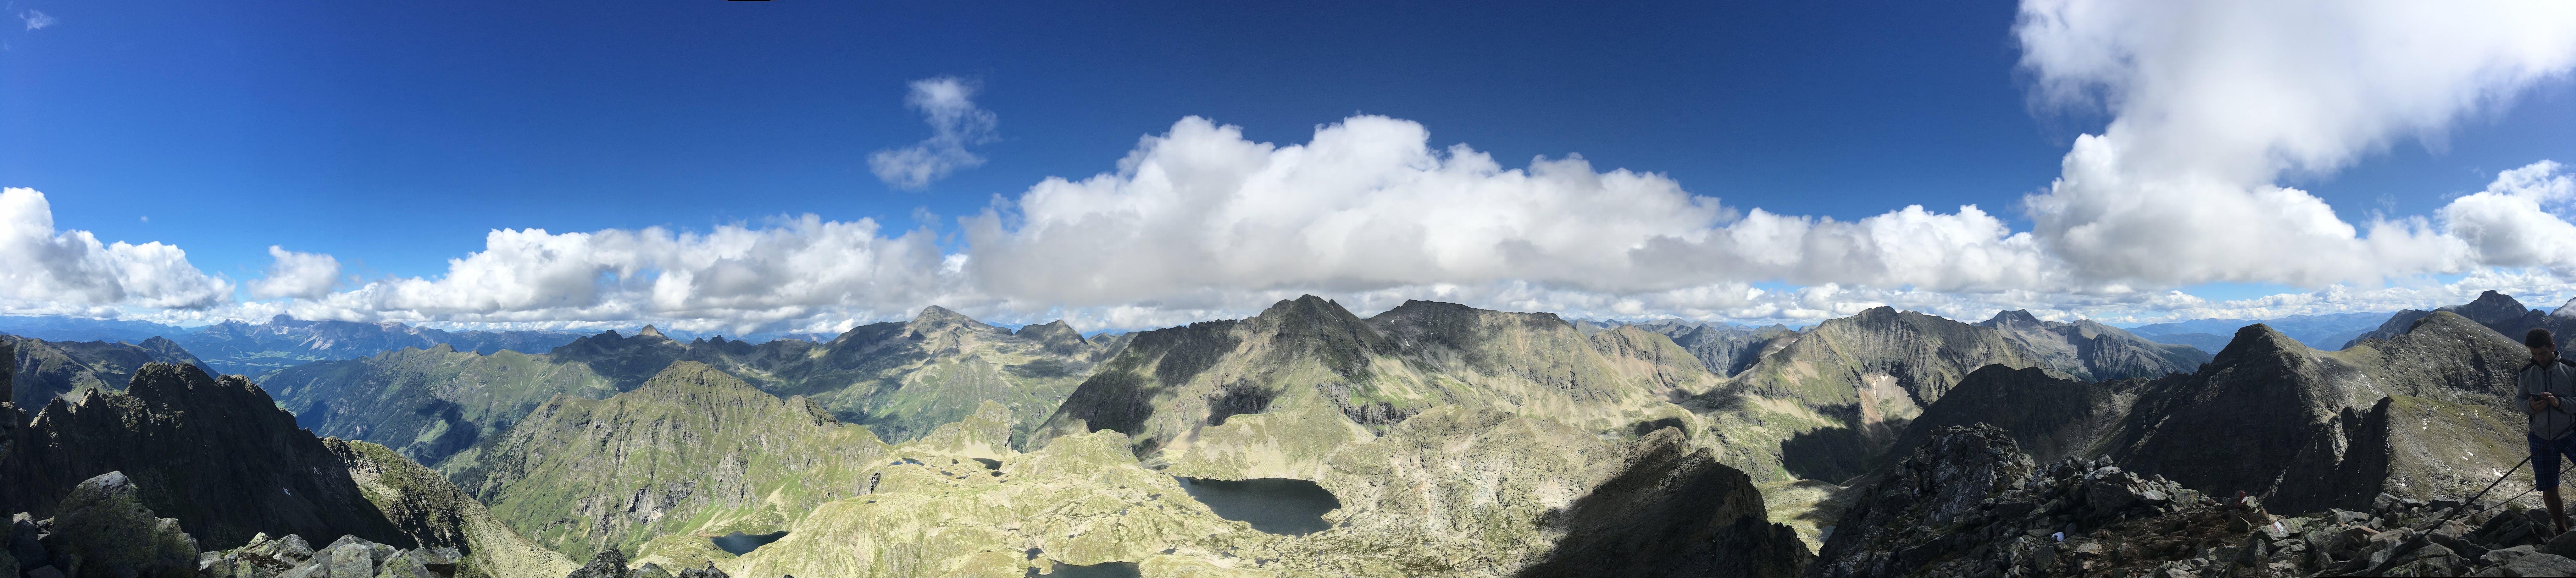 Panorama Photo of Mountains